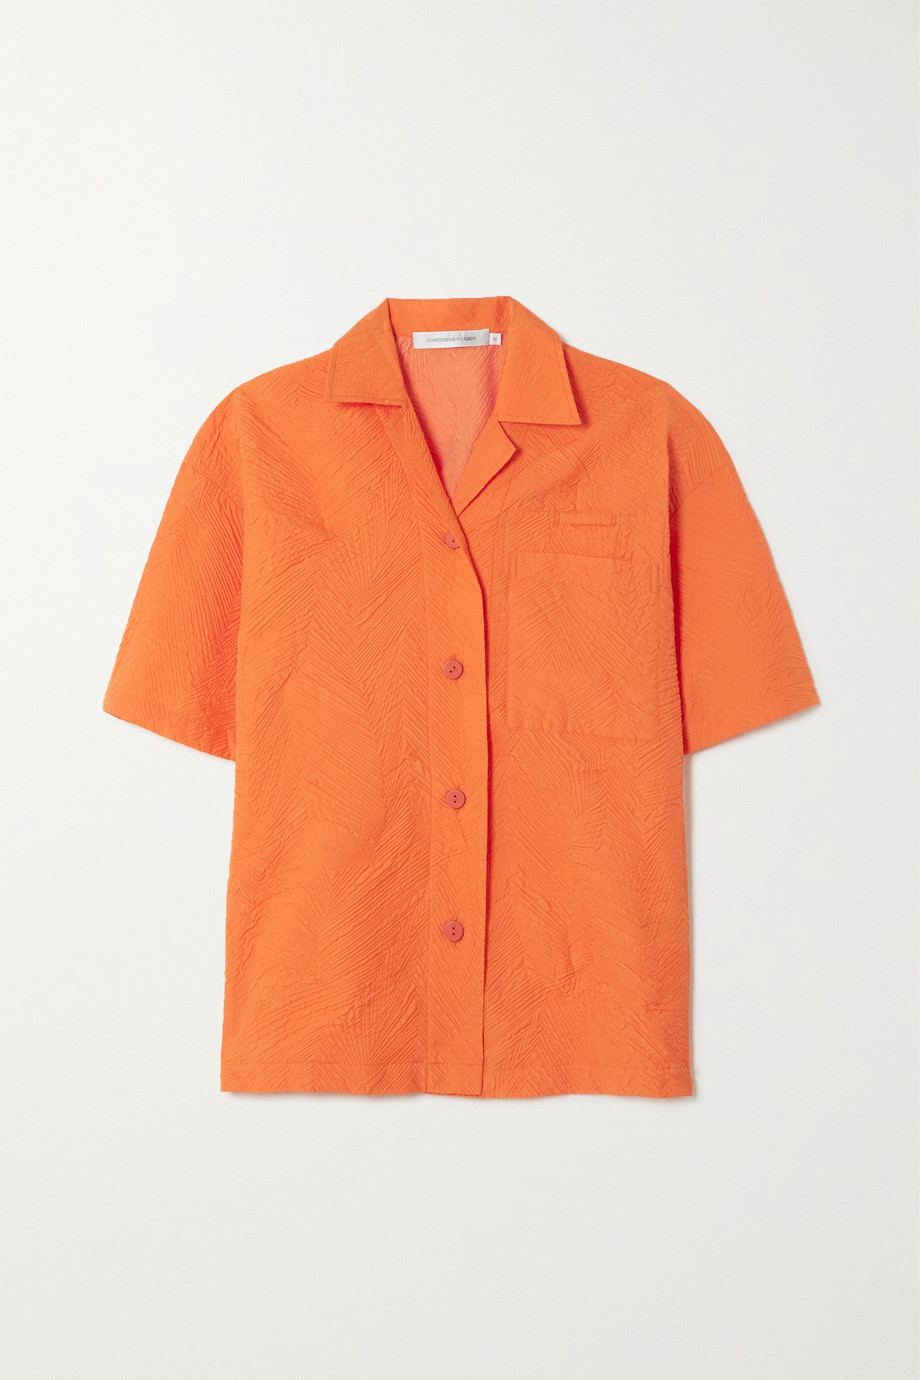 Christopher Esber Palm Tree cloqué shirt